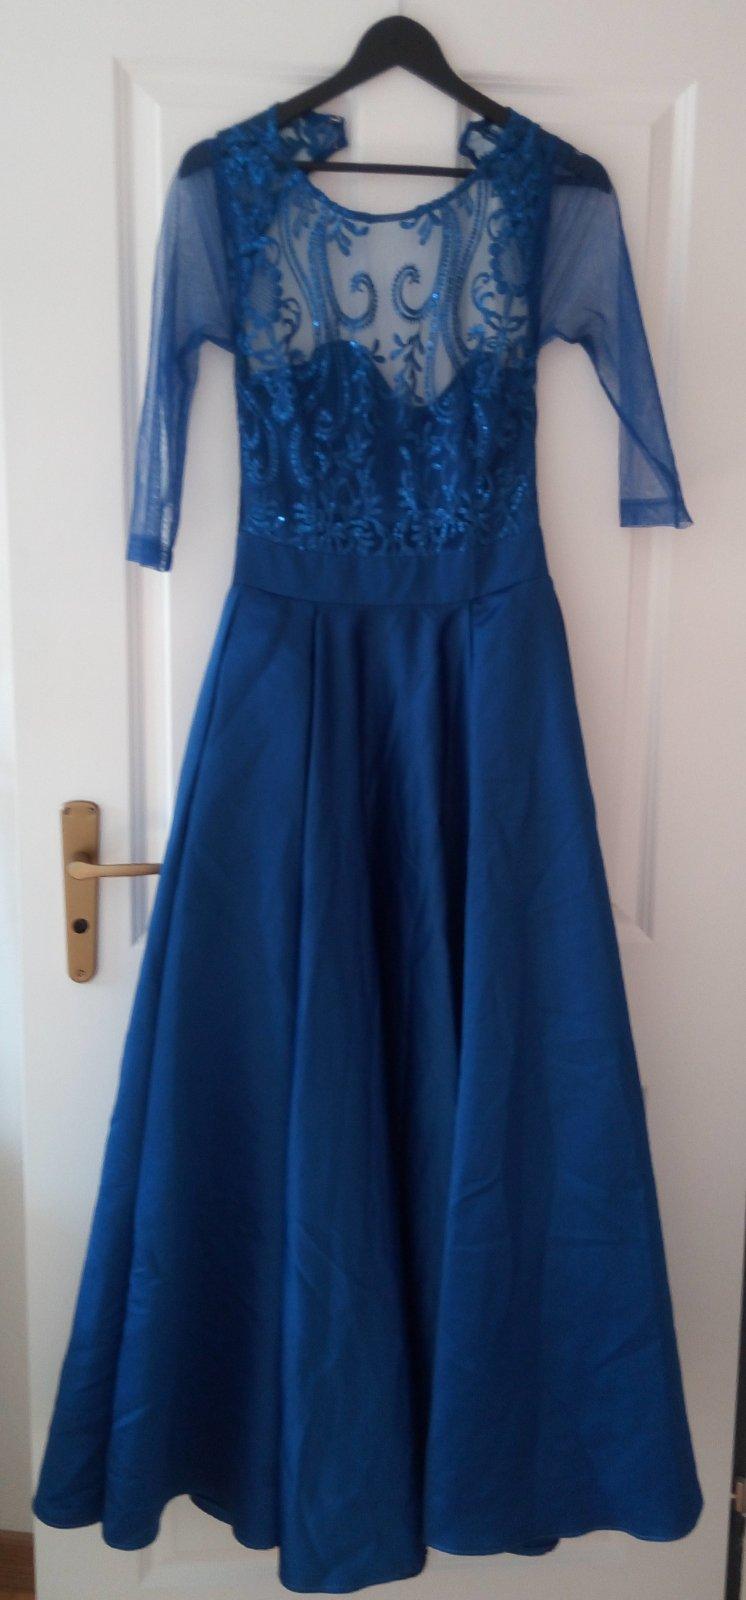 Kráľovsky modré spoločenské dlhé šaty XS - Obrázok č. 2